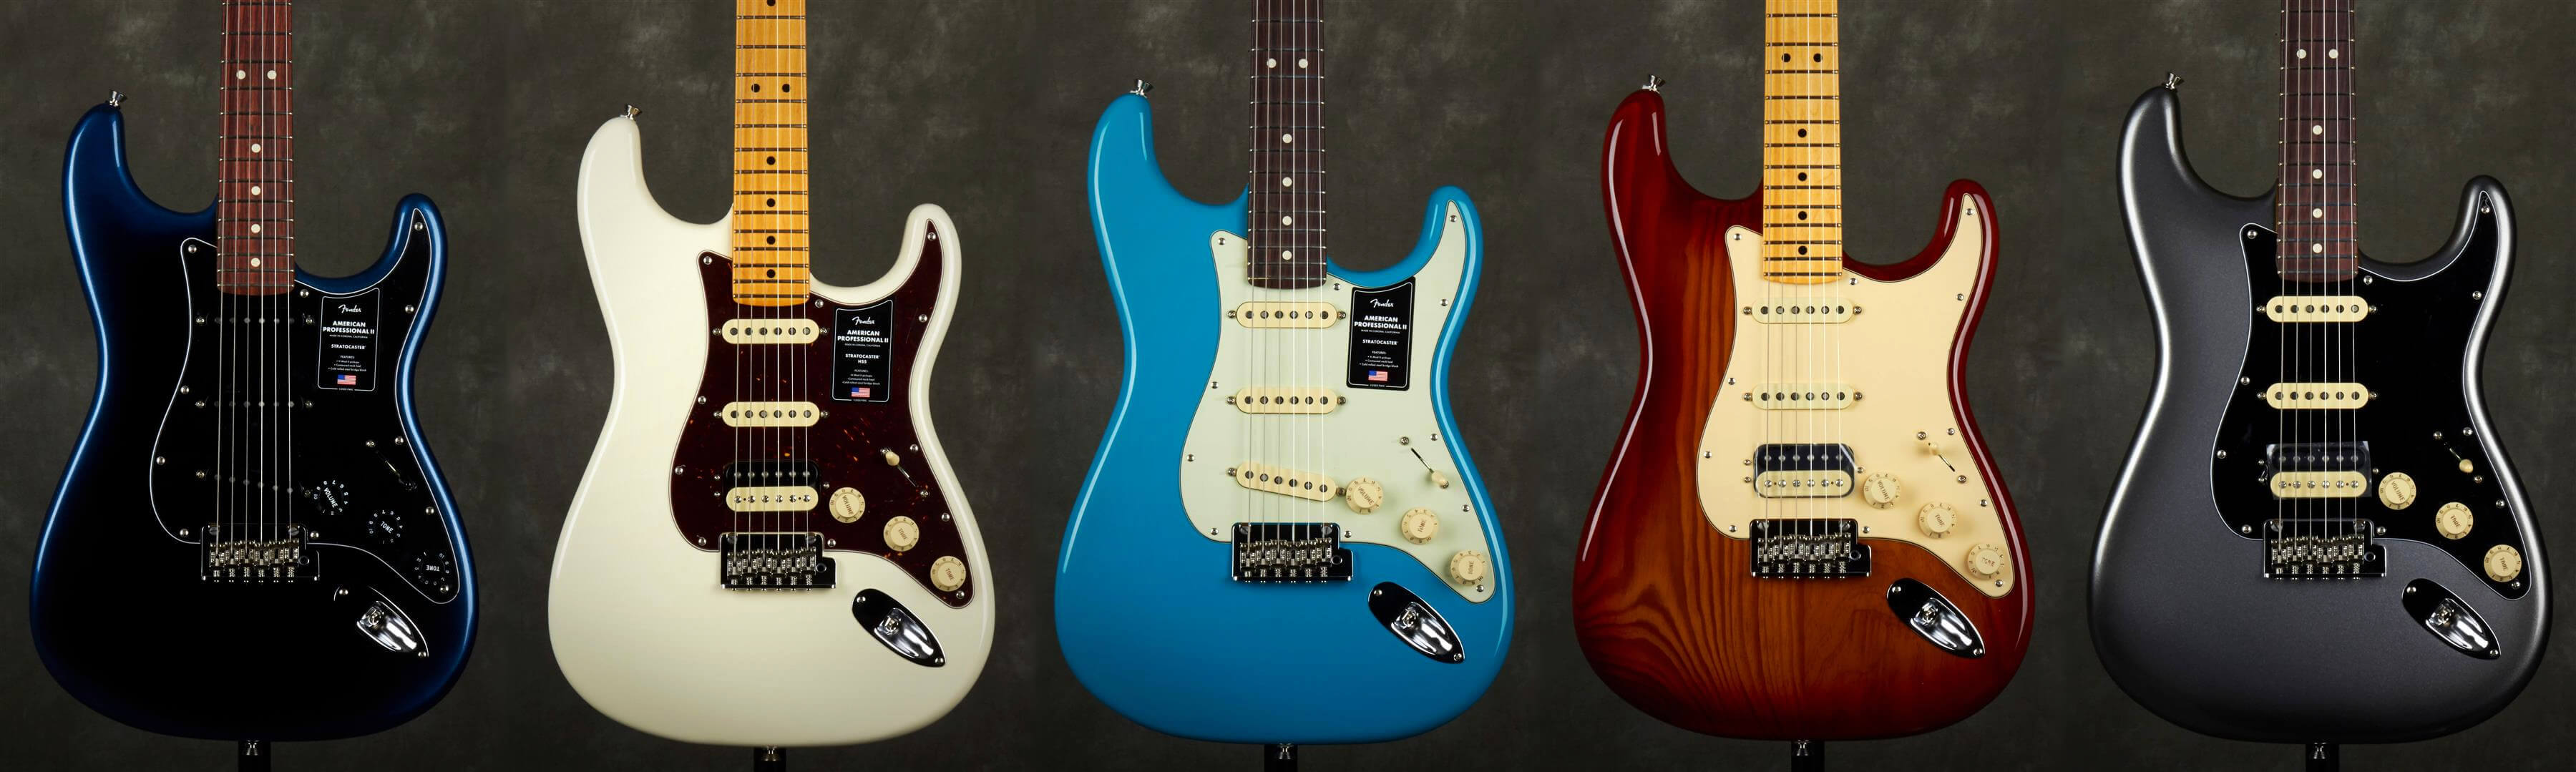 Am Pro II Stratocaster Colour options